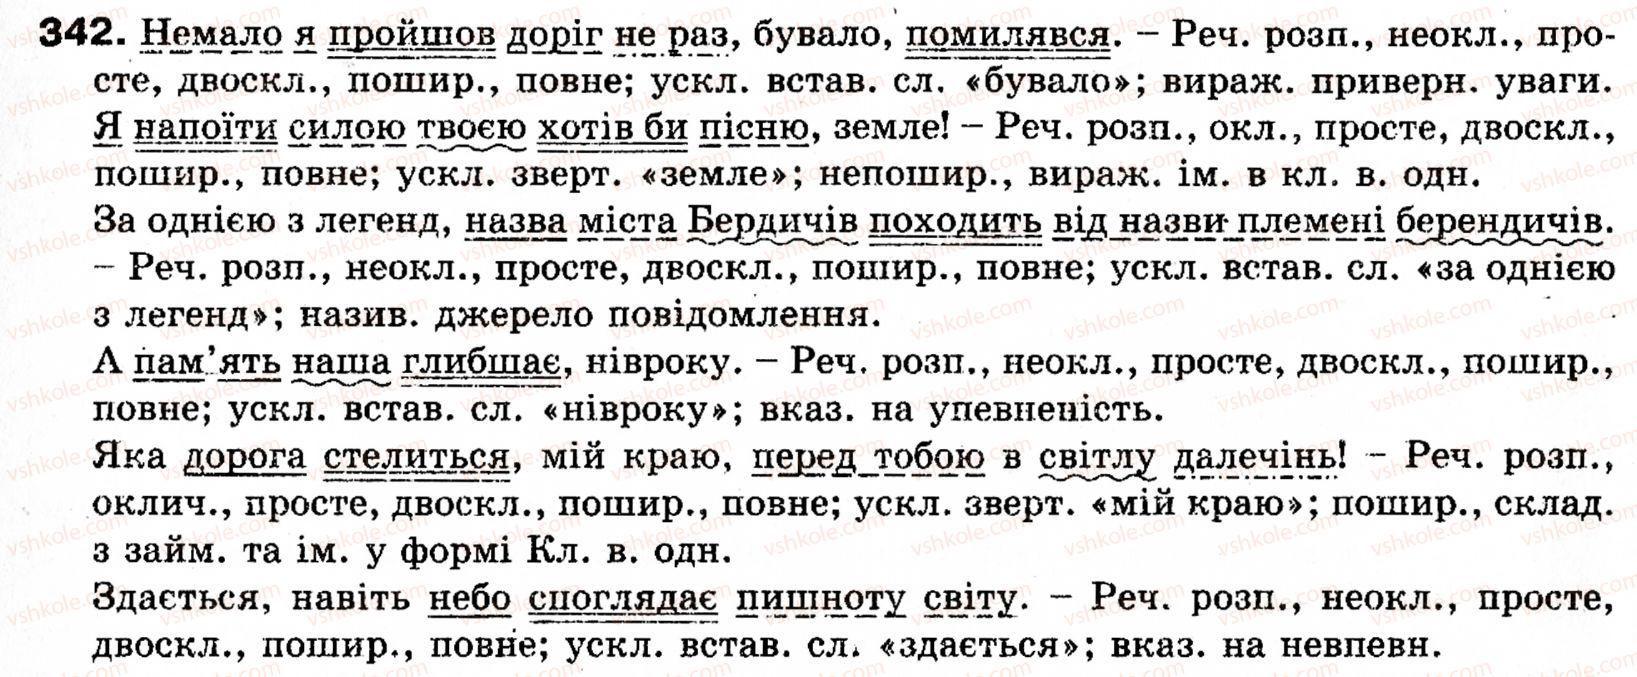 Глазова укр мова гдз 2007